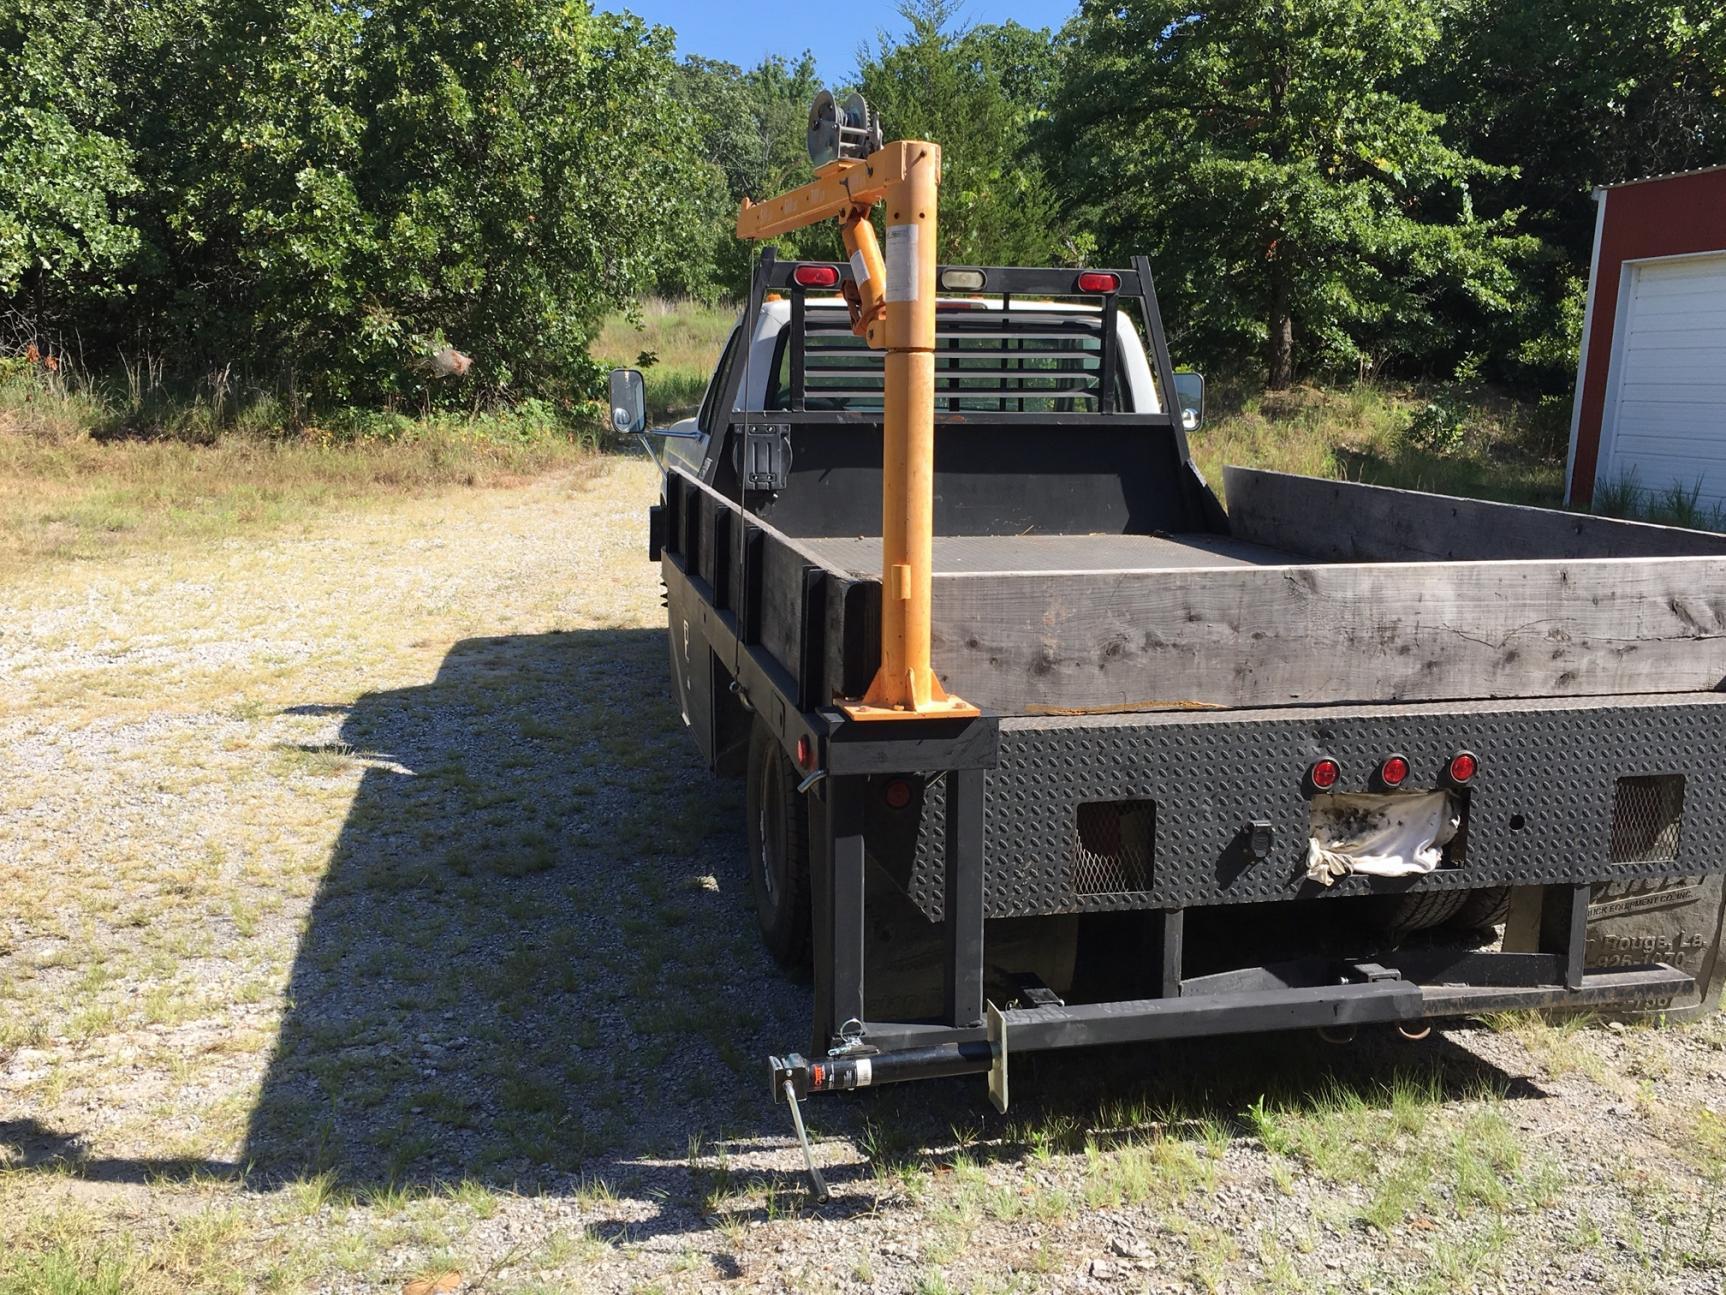 Harbor freight jib crane mounts truck and shop crane stowed travel